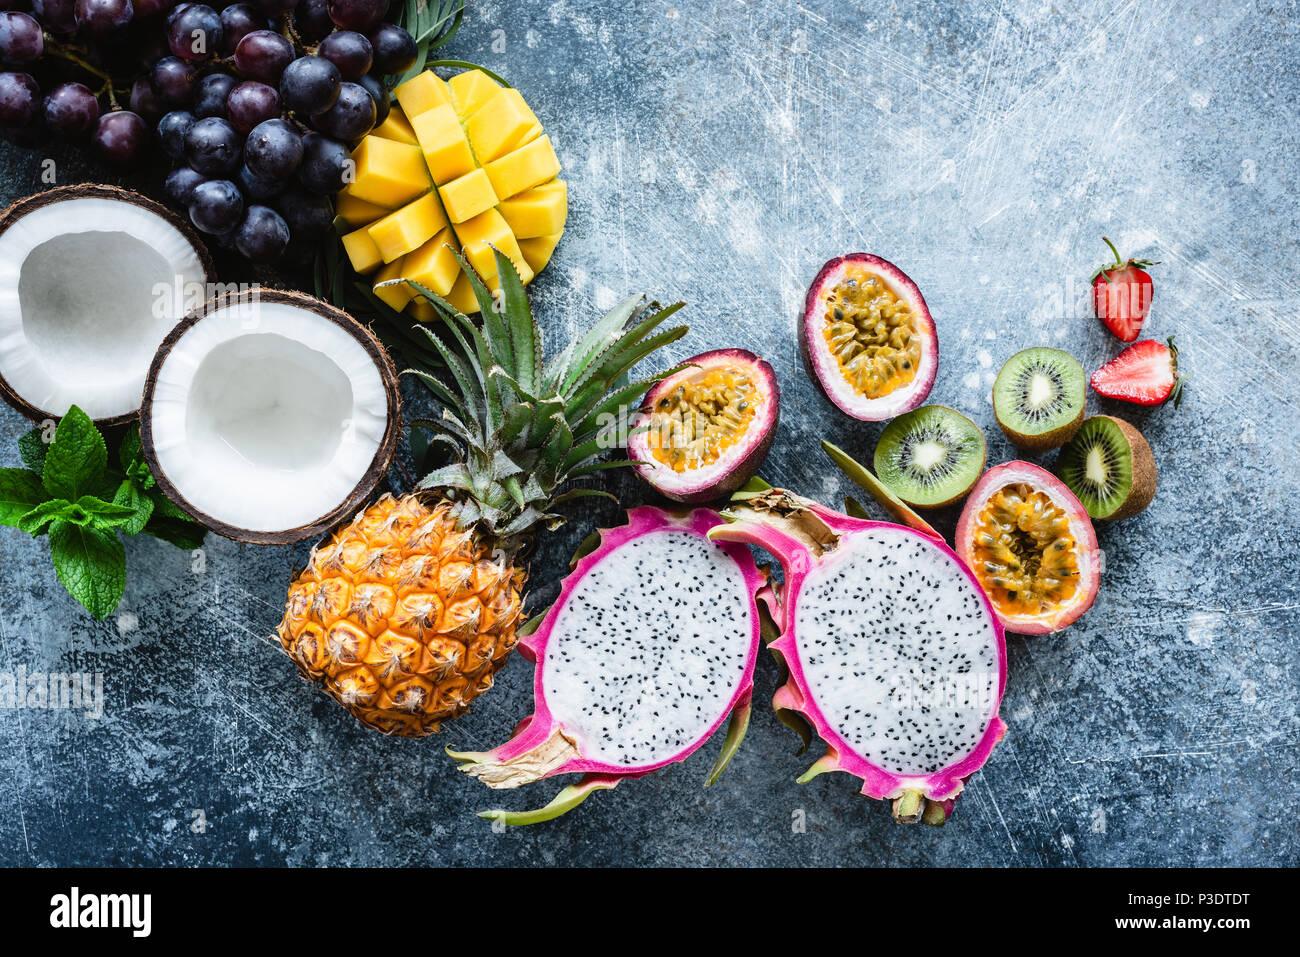 Group of exotic tropical fruits. Mango, dragon fruit, passion fruit, coconut, kiwi, pineapple and strawberry on concrete blue background. Fresh fruit  - Stock Image